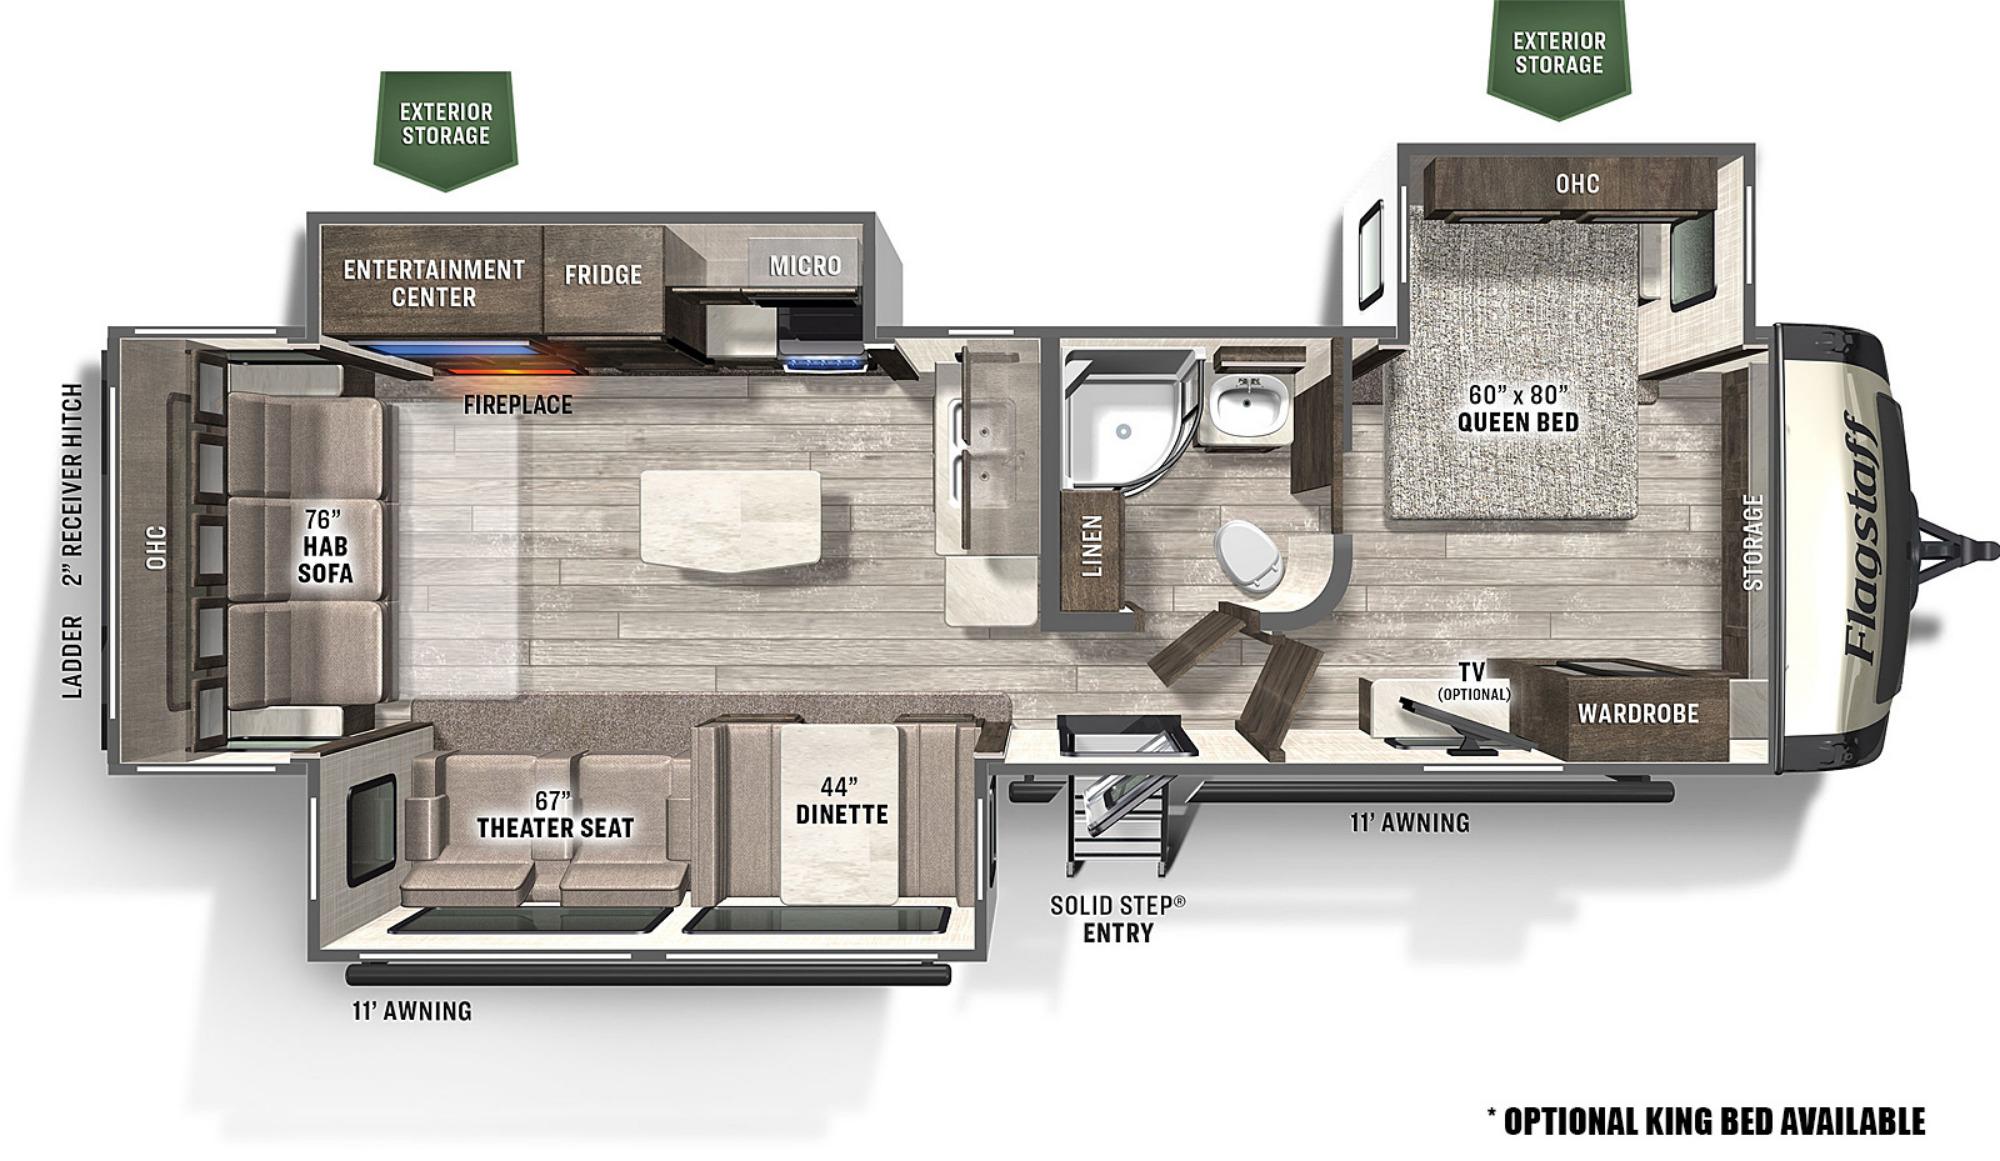 View Floor Plan for 2021 FOREST RIVER FLAGSTAFF SUPER LITE 29RLBS